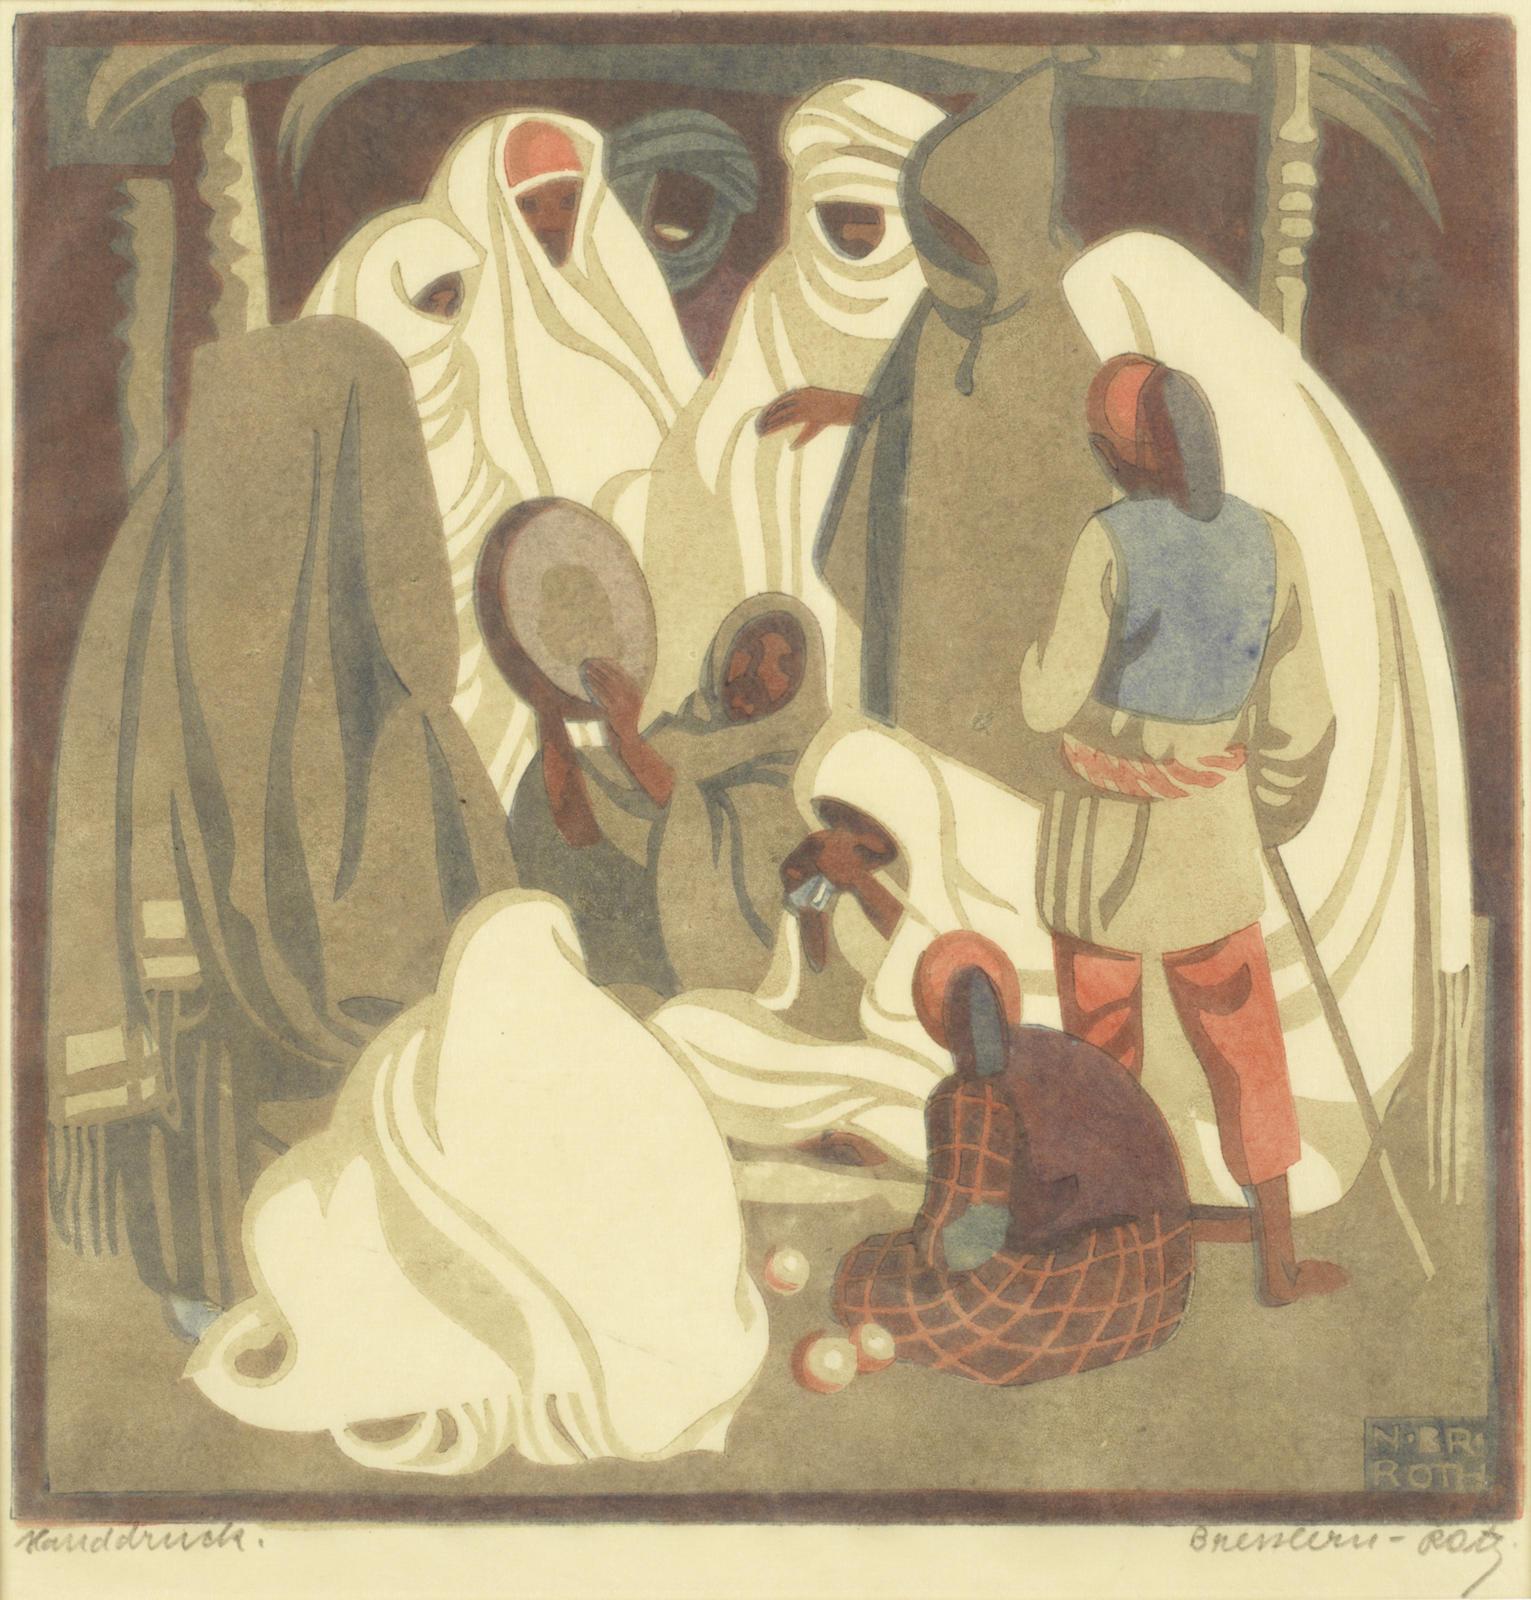 Norbertine von Bresslern-Roth-Musikanten; Altstadt; Blaues Haus, from 'Tripolis series'-1928